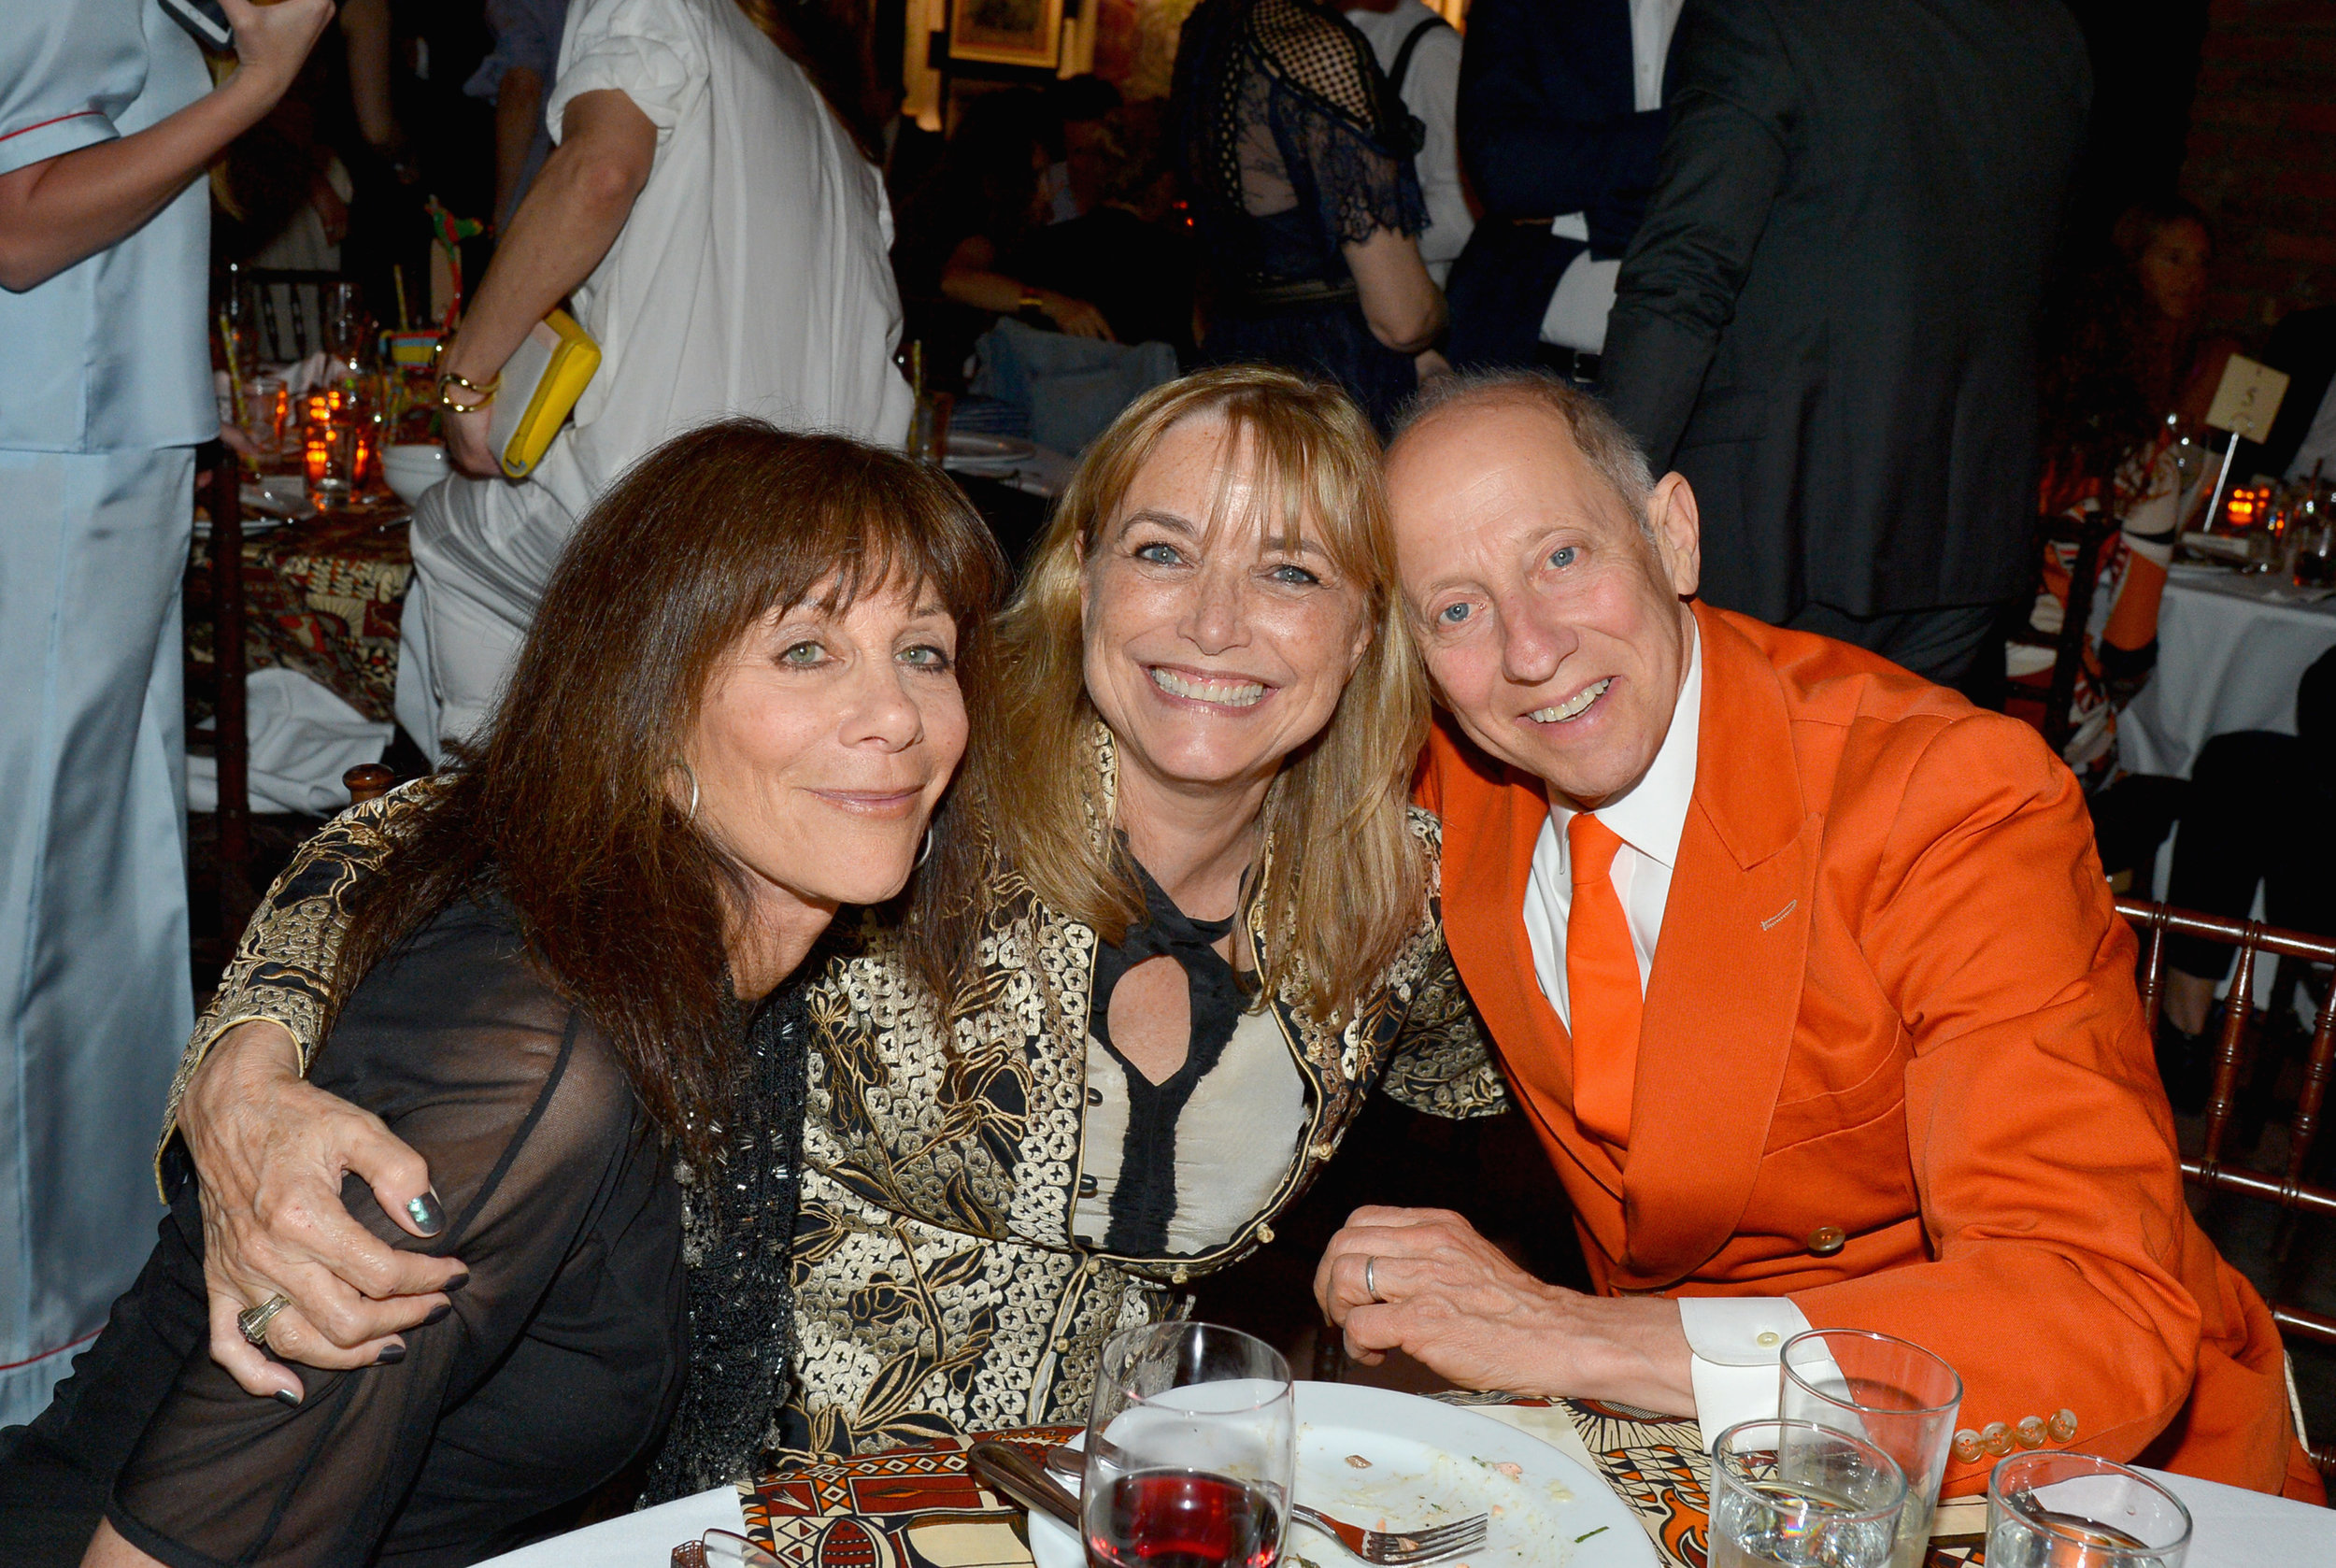 Lynn Goldsmith, Karen Allen, and Knight Landesman